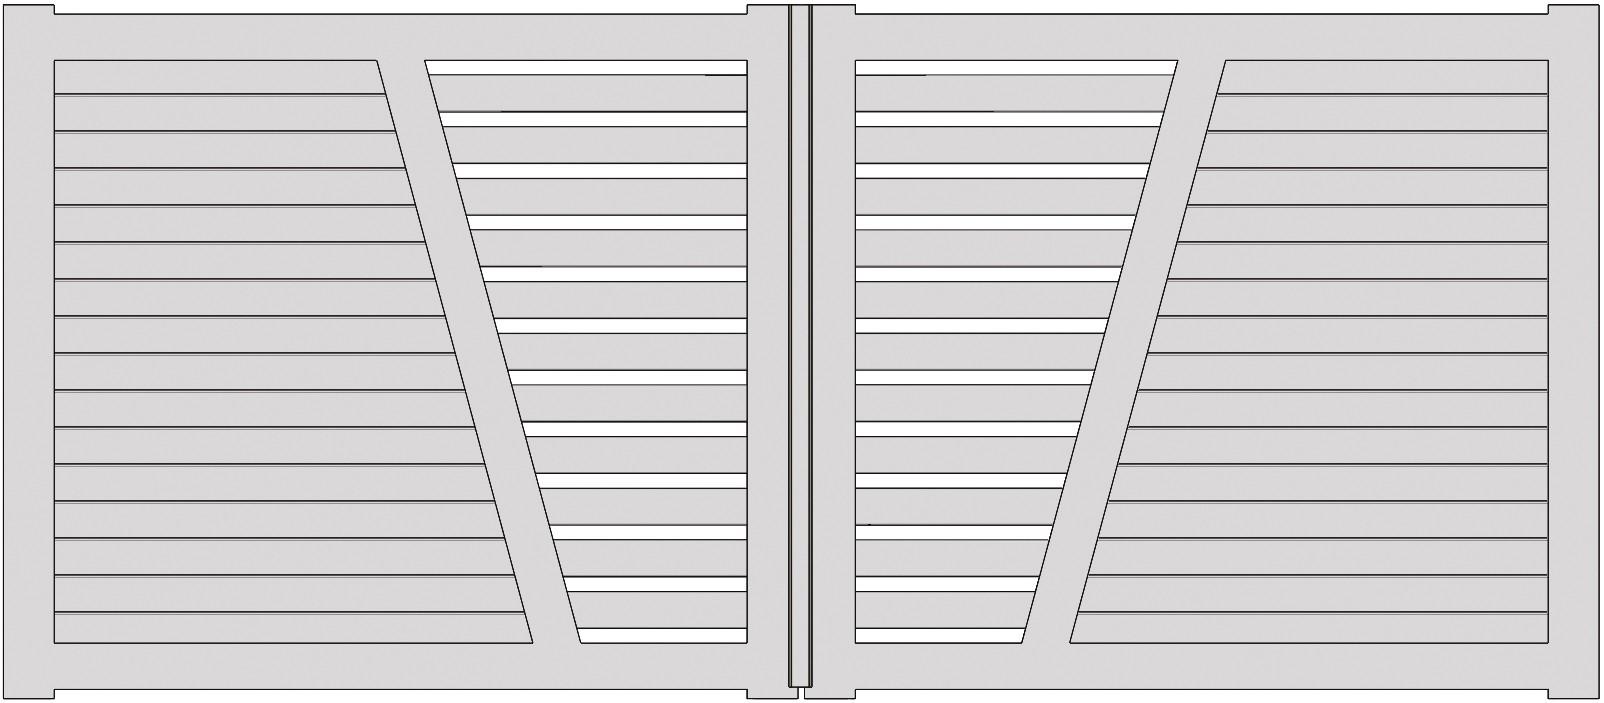 Schéma du portail Marcilly